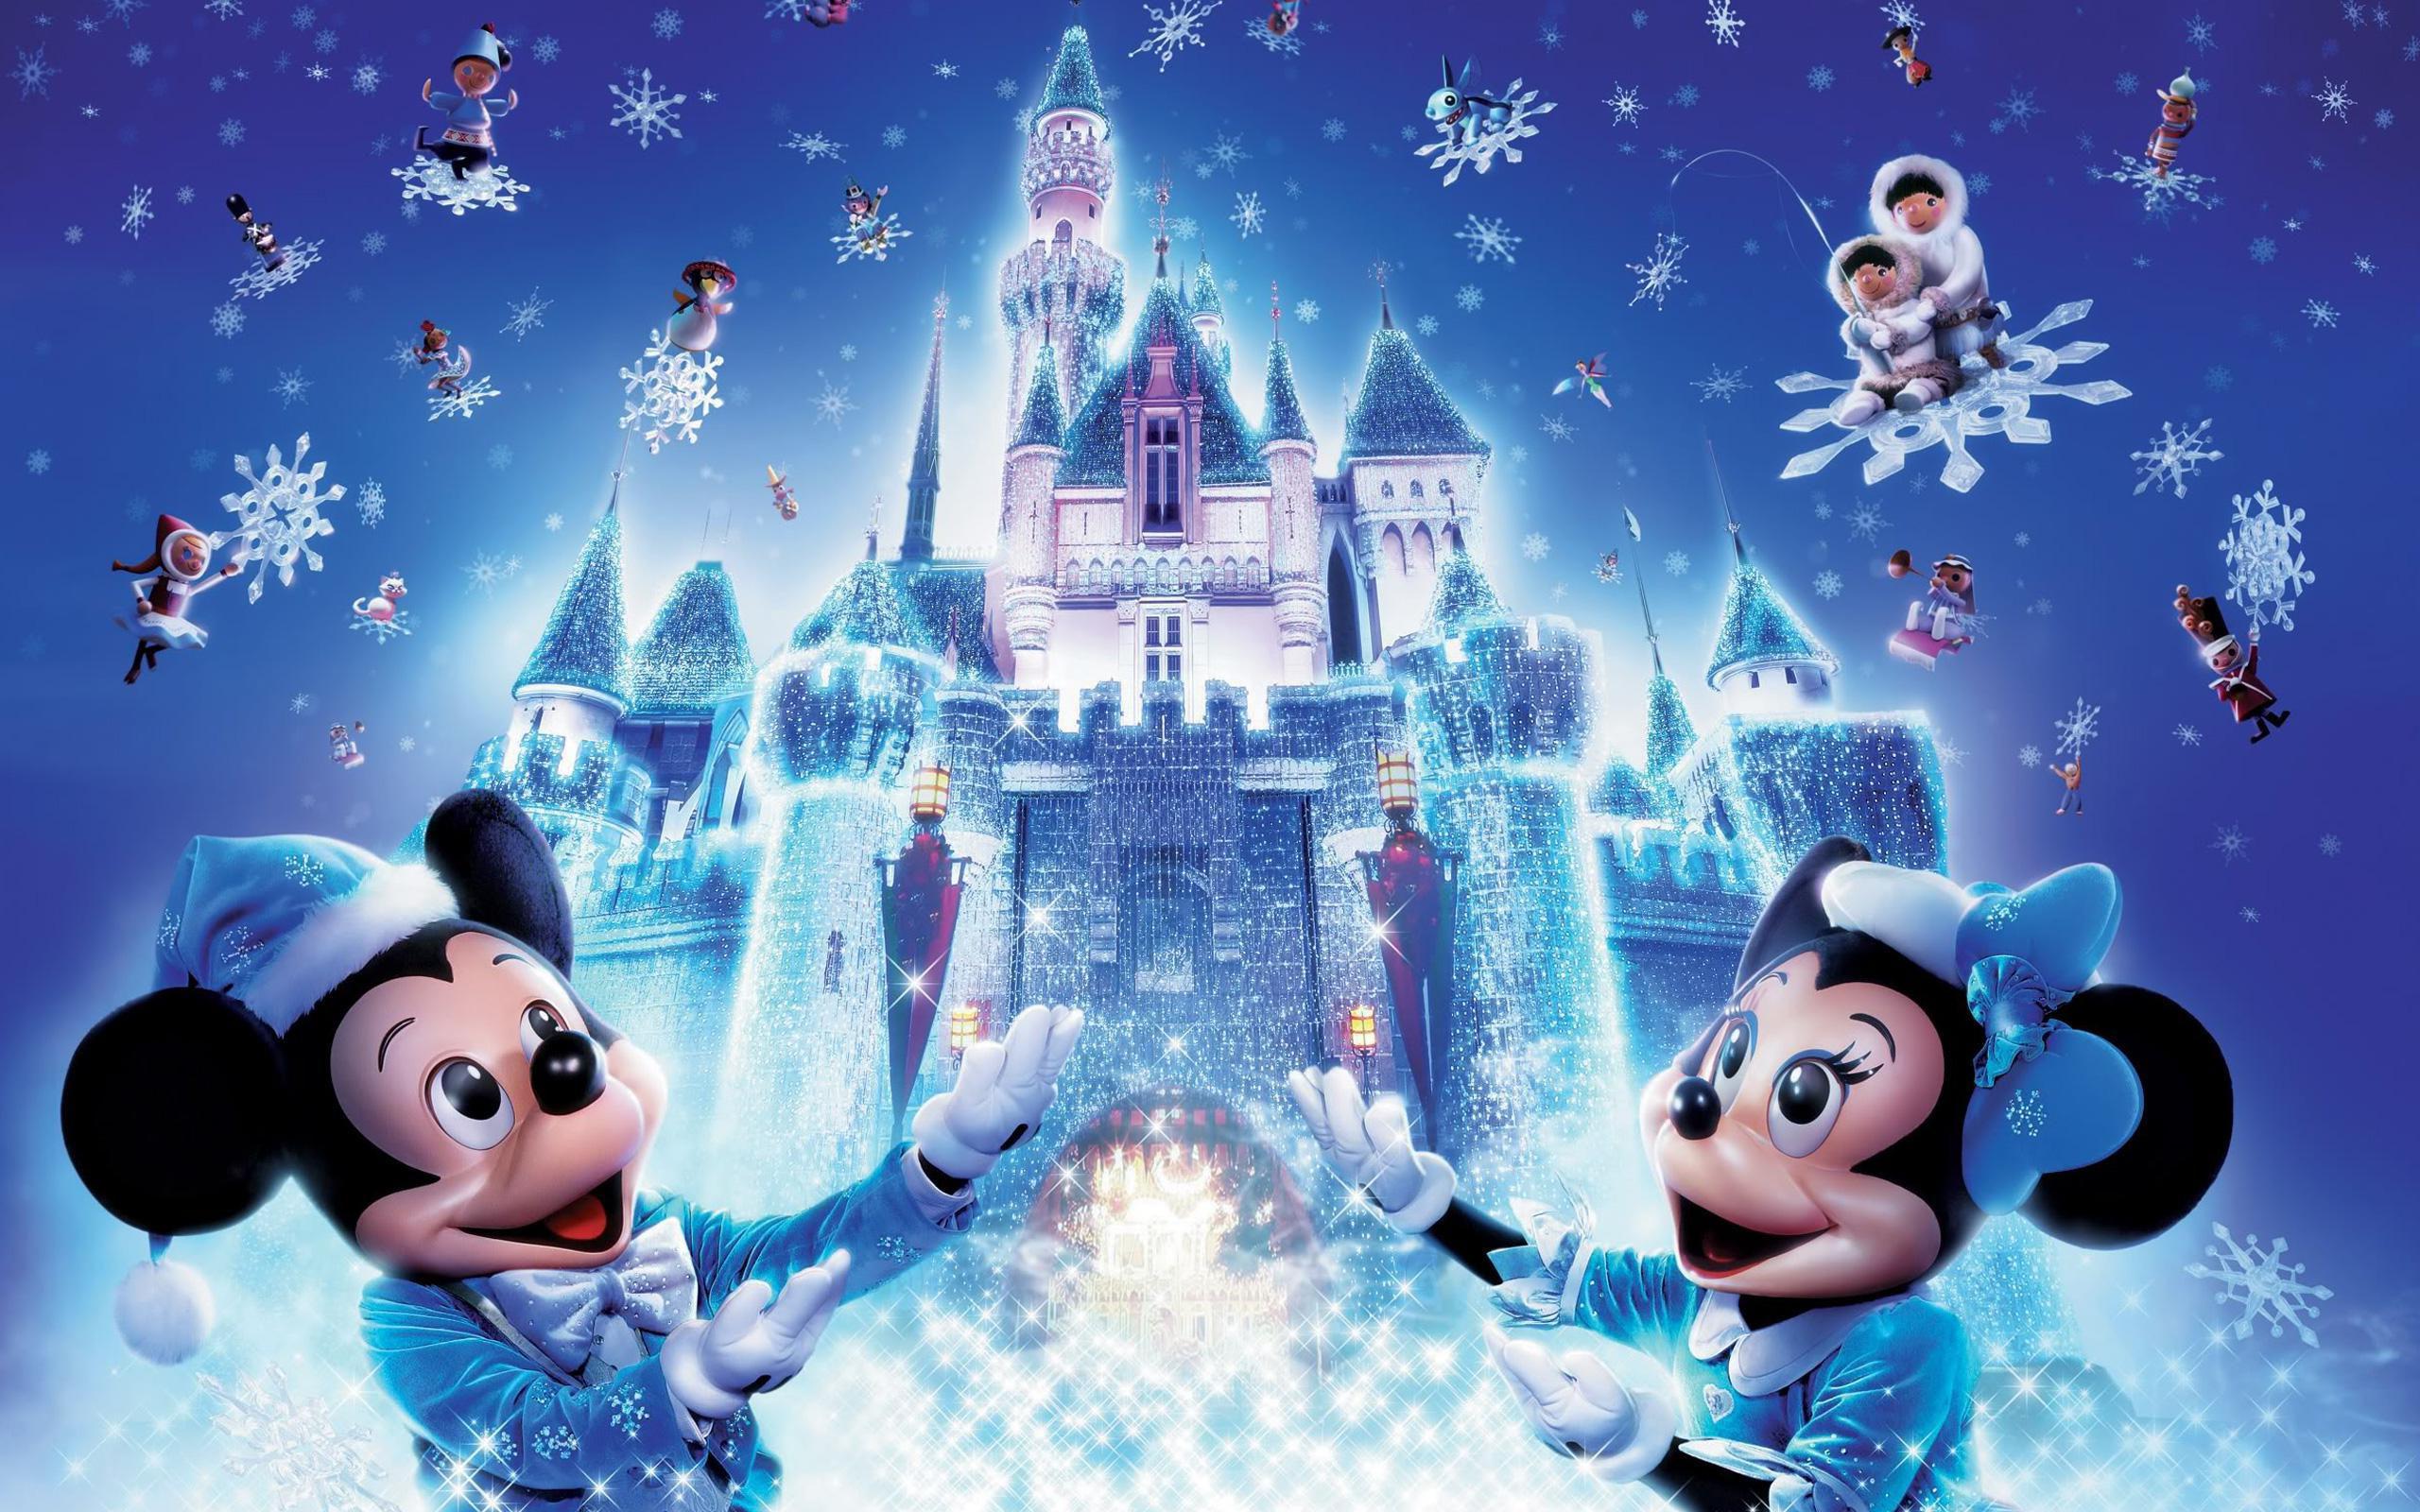 Fonds d'écran Noël Disney - MaximumWall